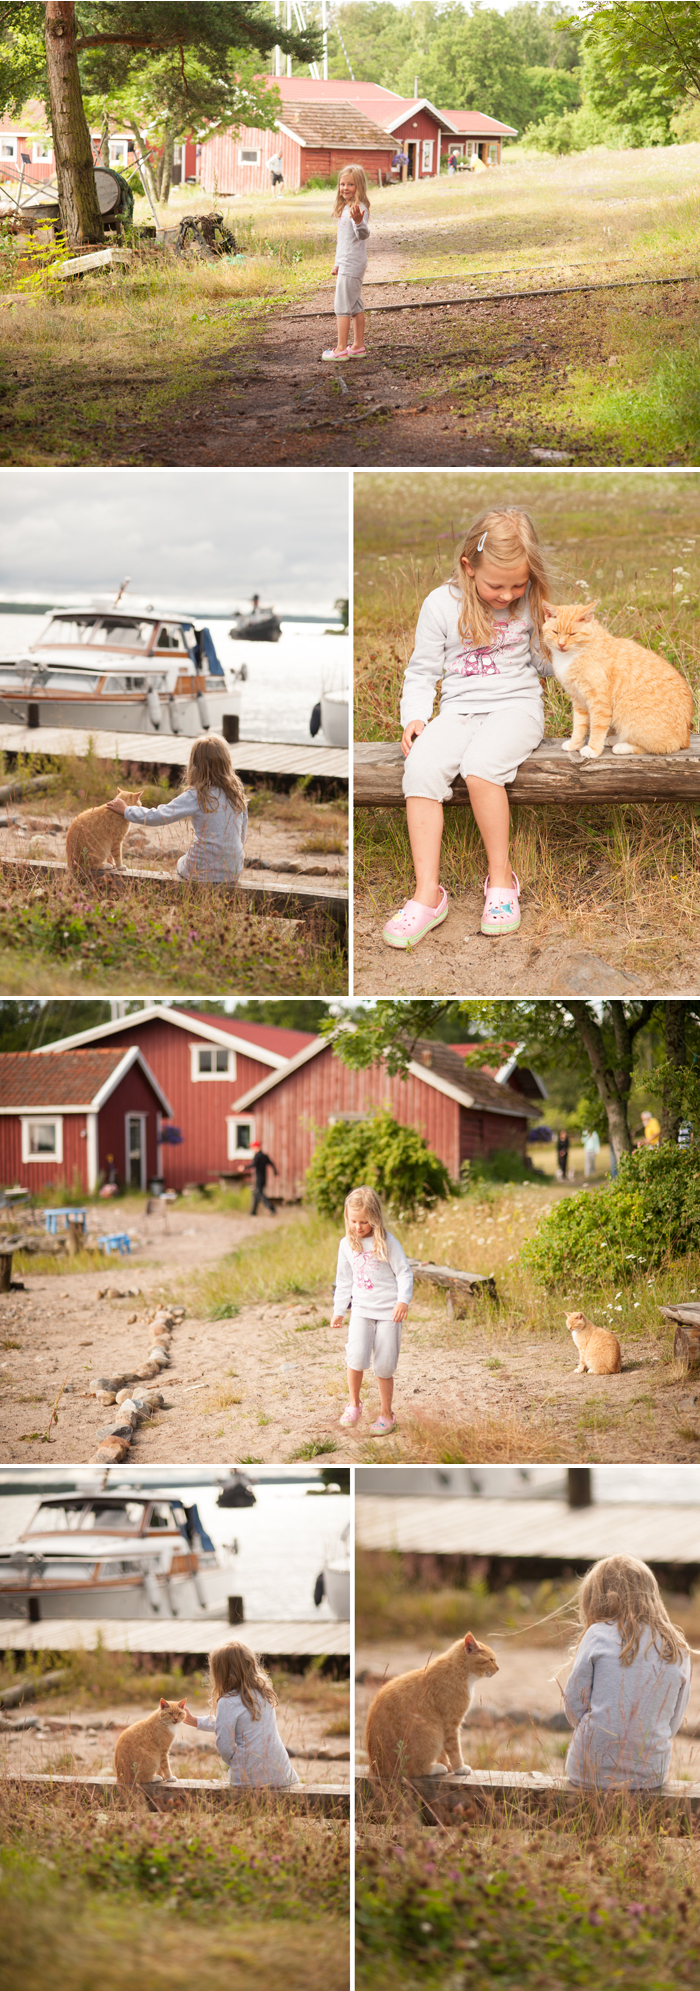 Freja&katten_edited-1